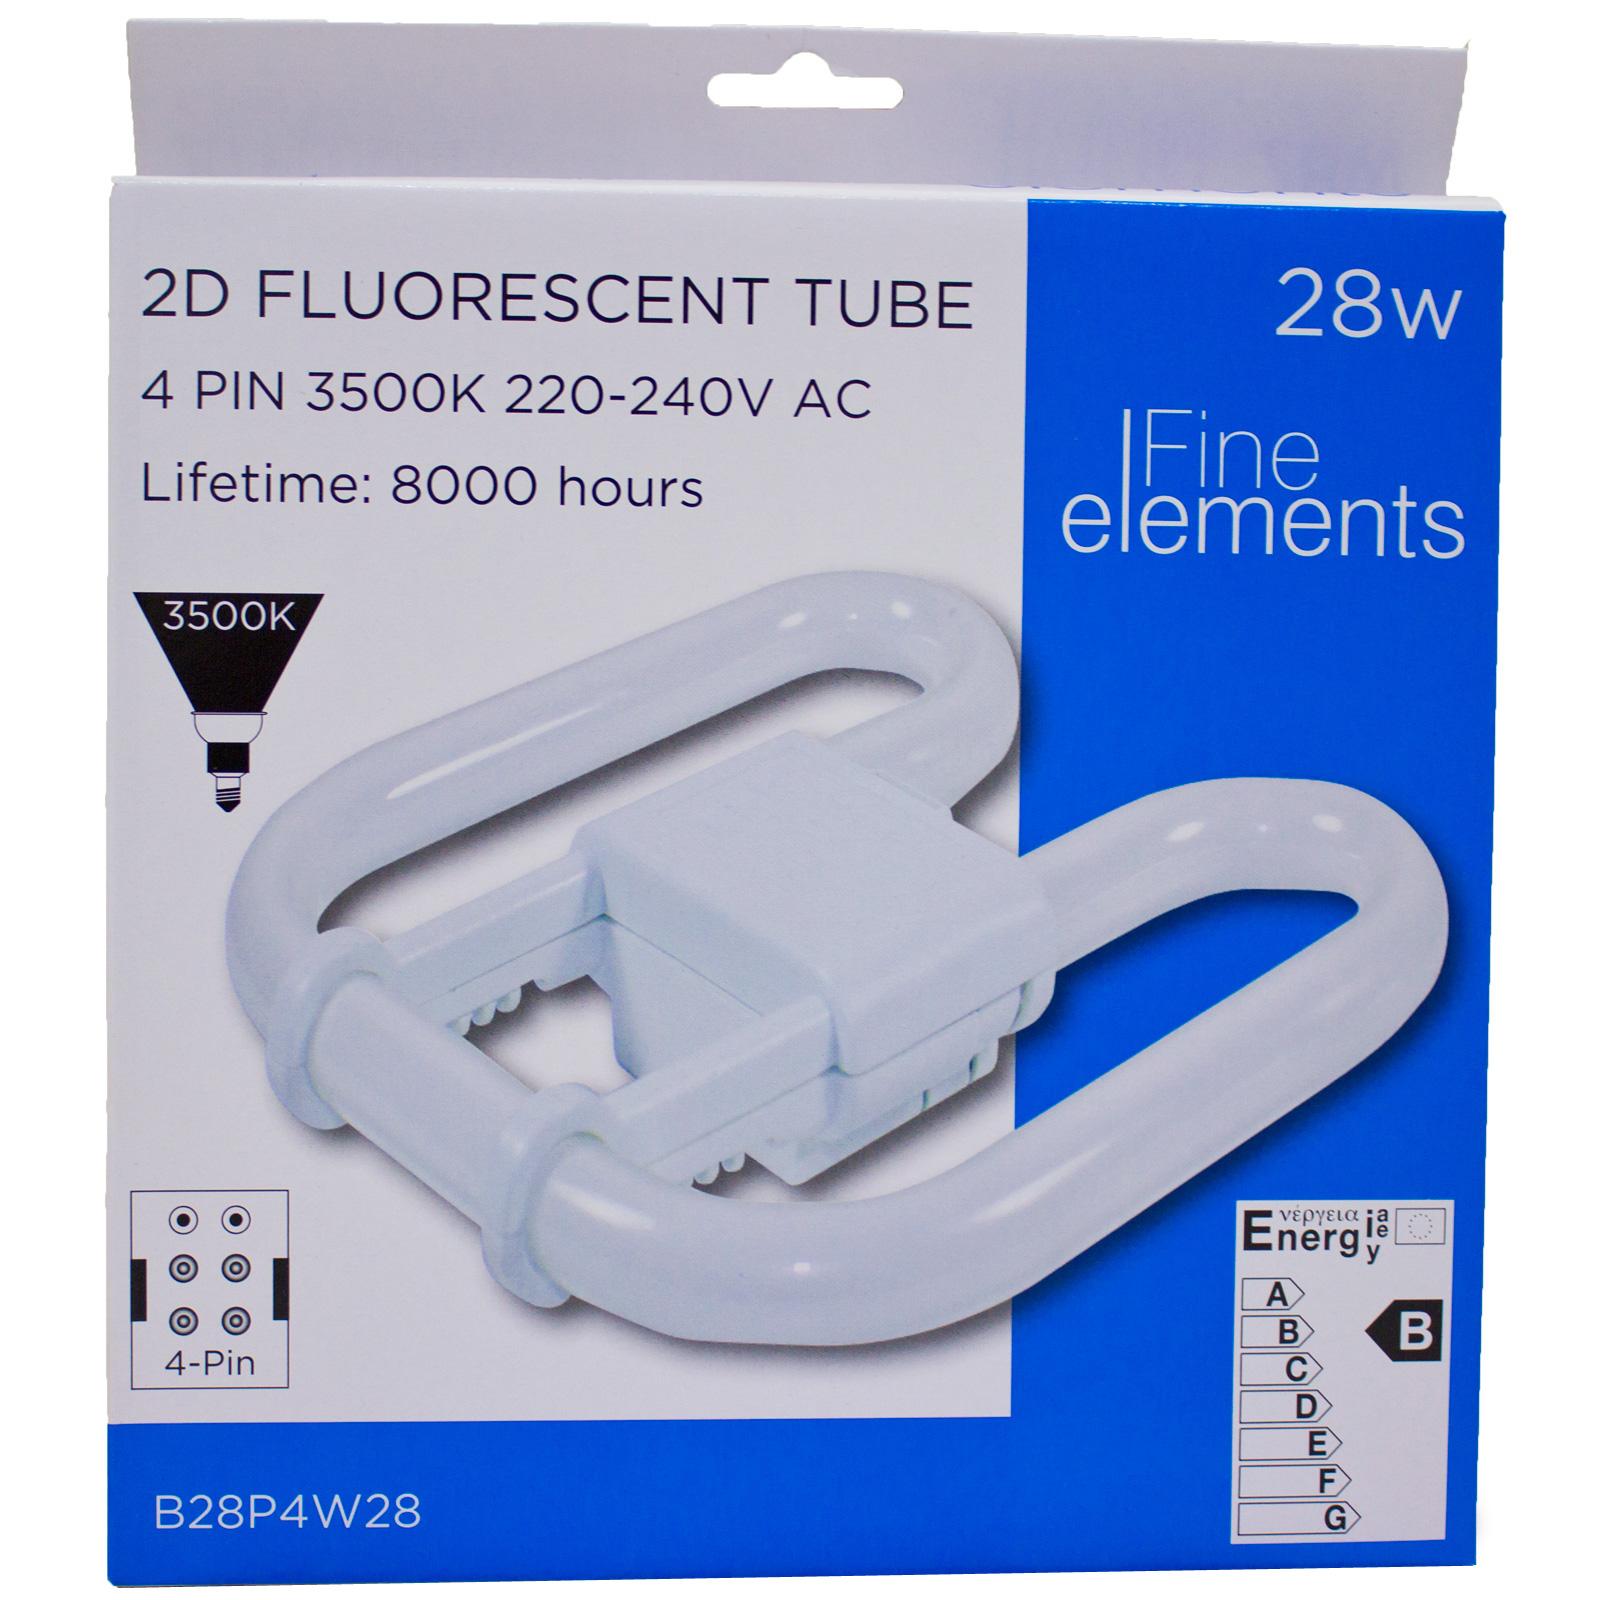 Fluorescent Light Elements: Fine Elements 2D Fluorescent 28W 4 Pin Energy Saving Light